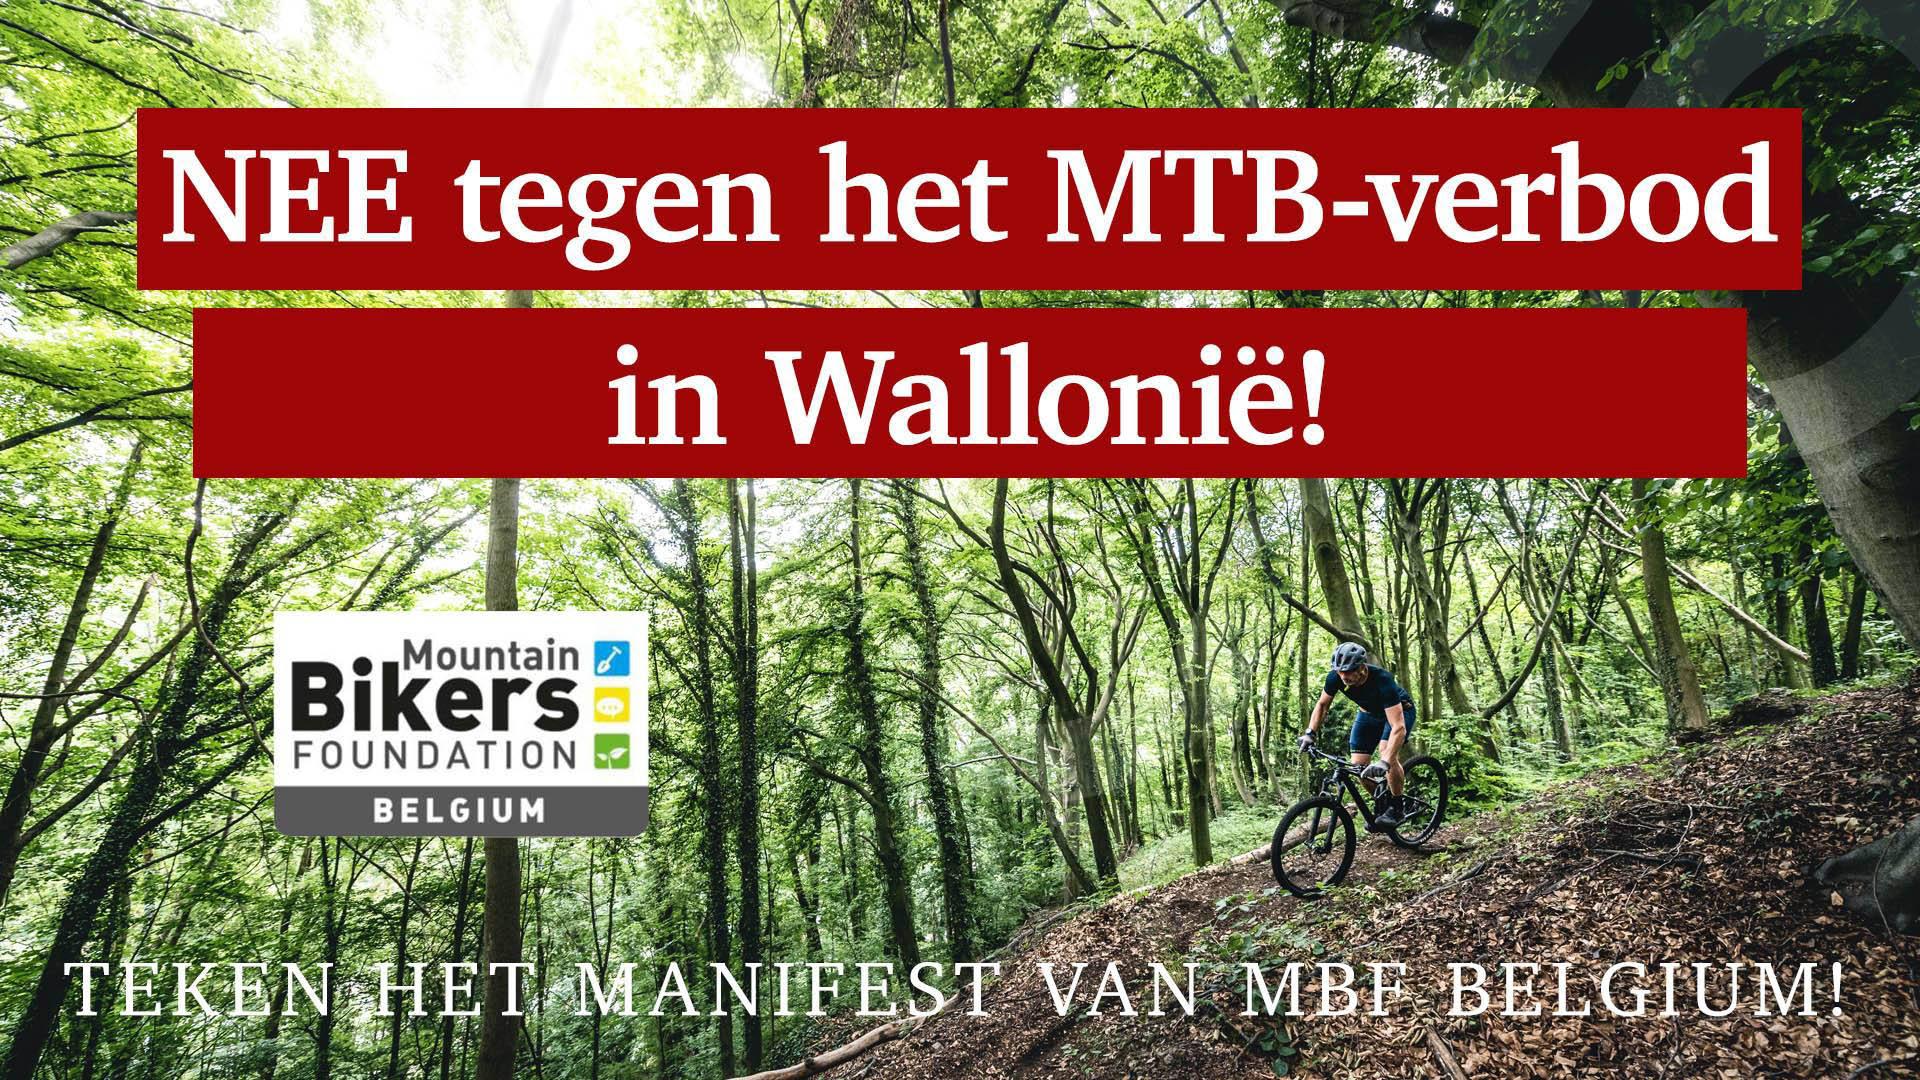 MBF Mountainbike verbod Wallonië